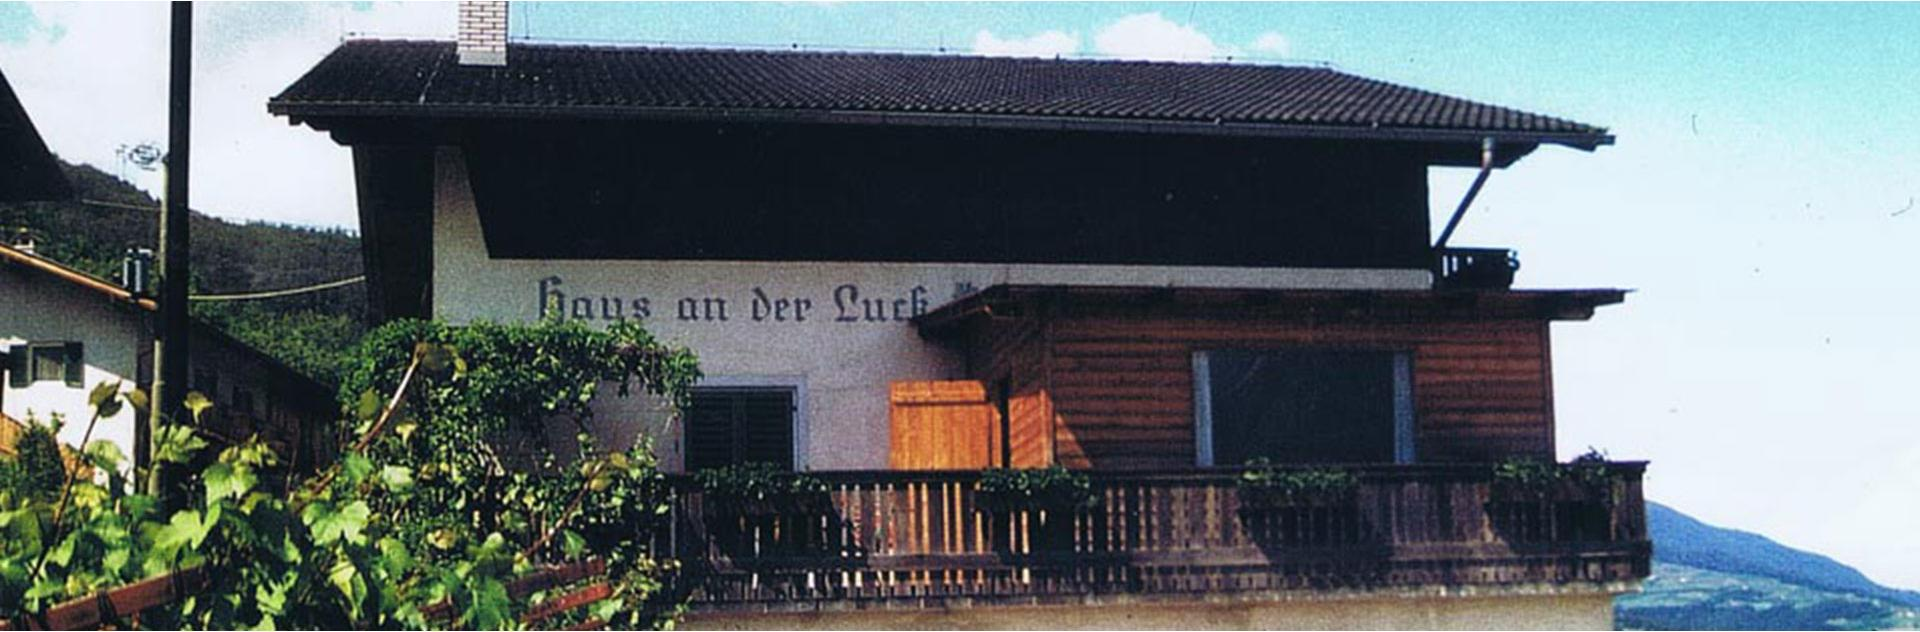 Haus an der Luck Hotel in Barbian bei Klausen